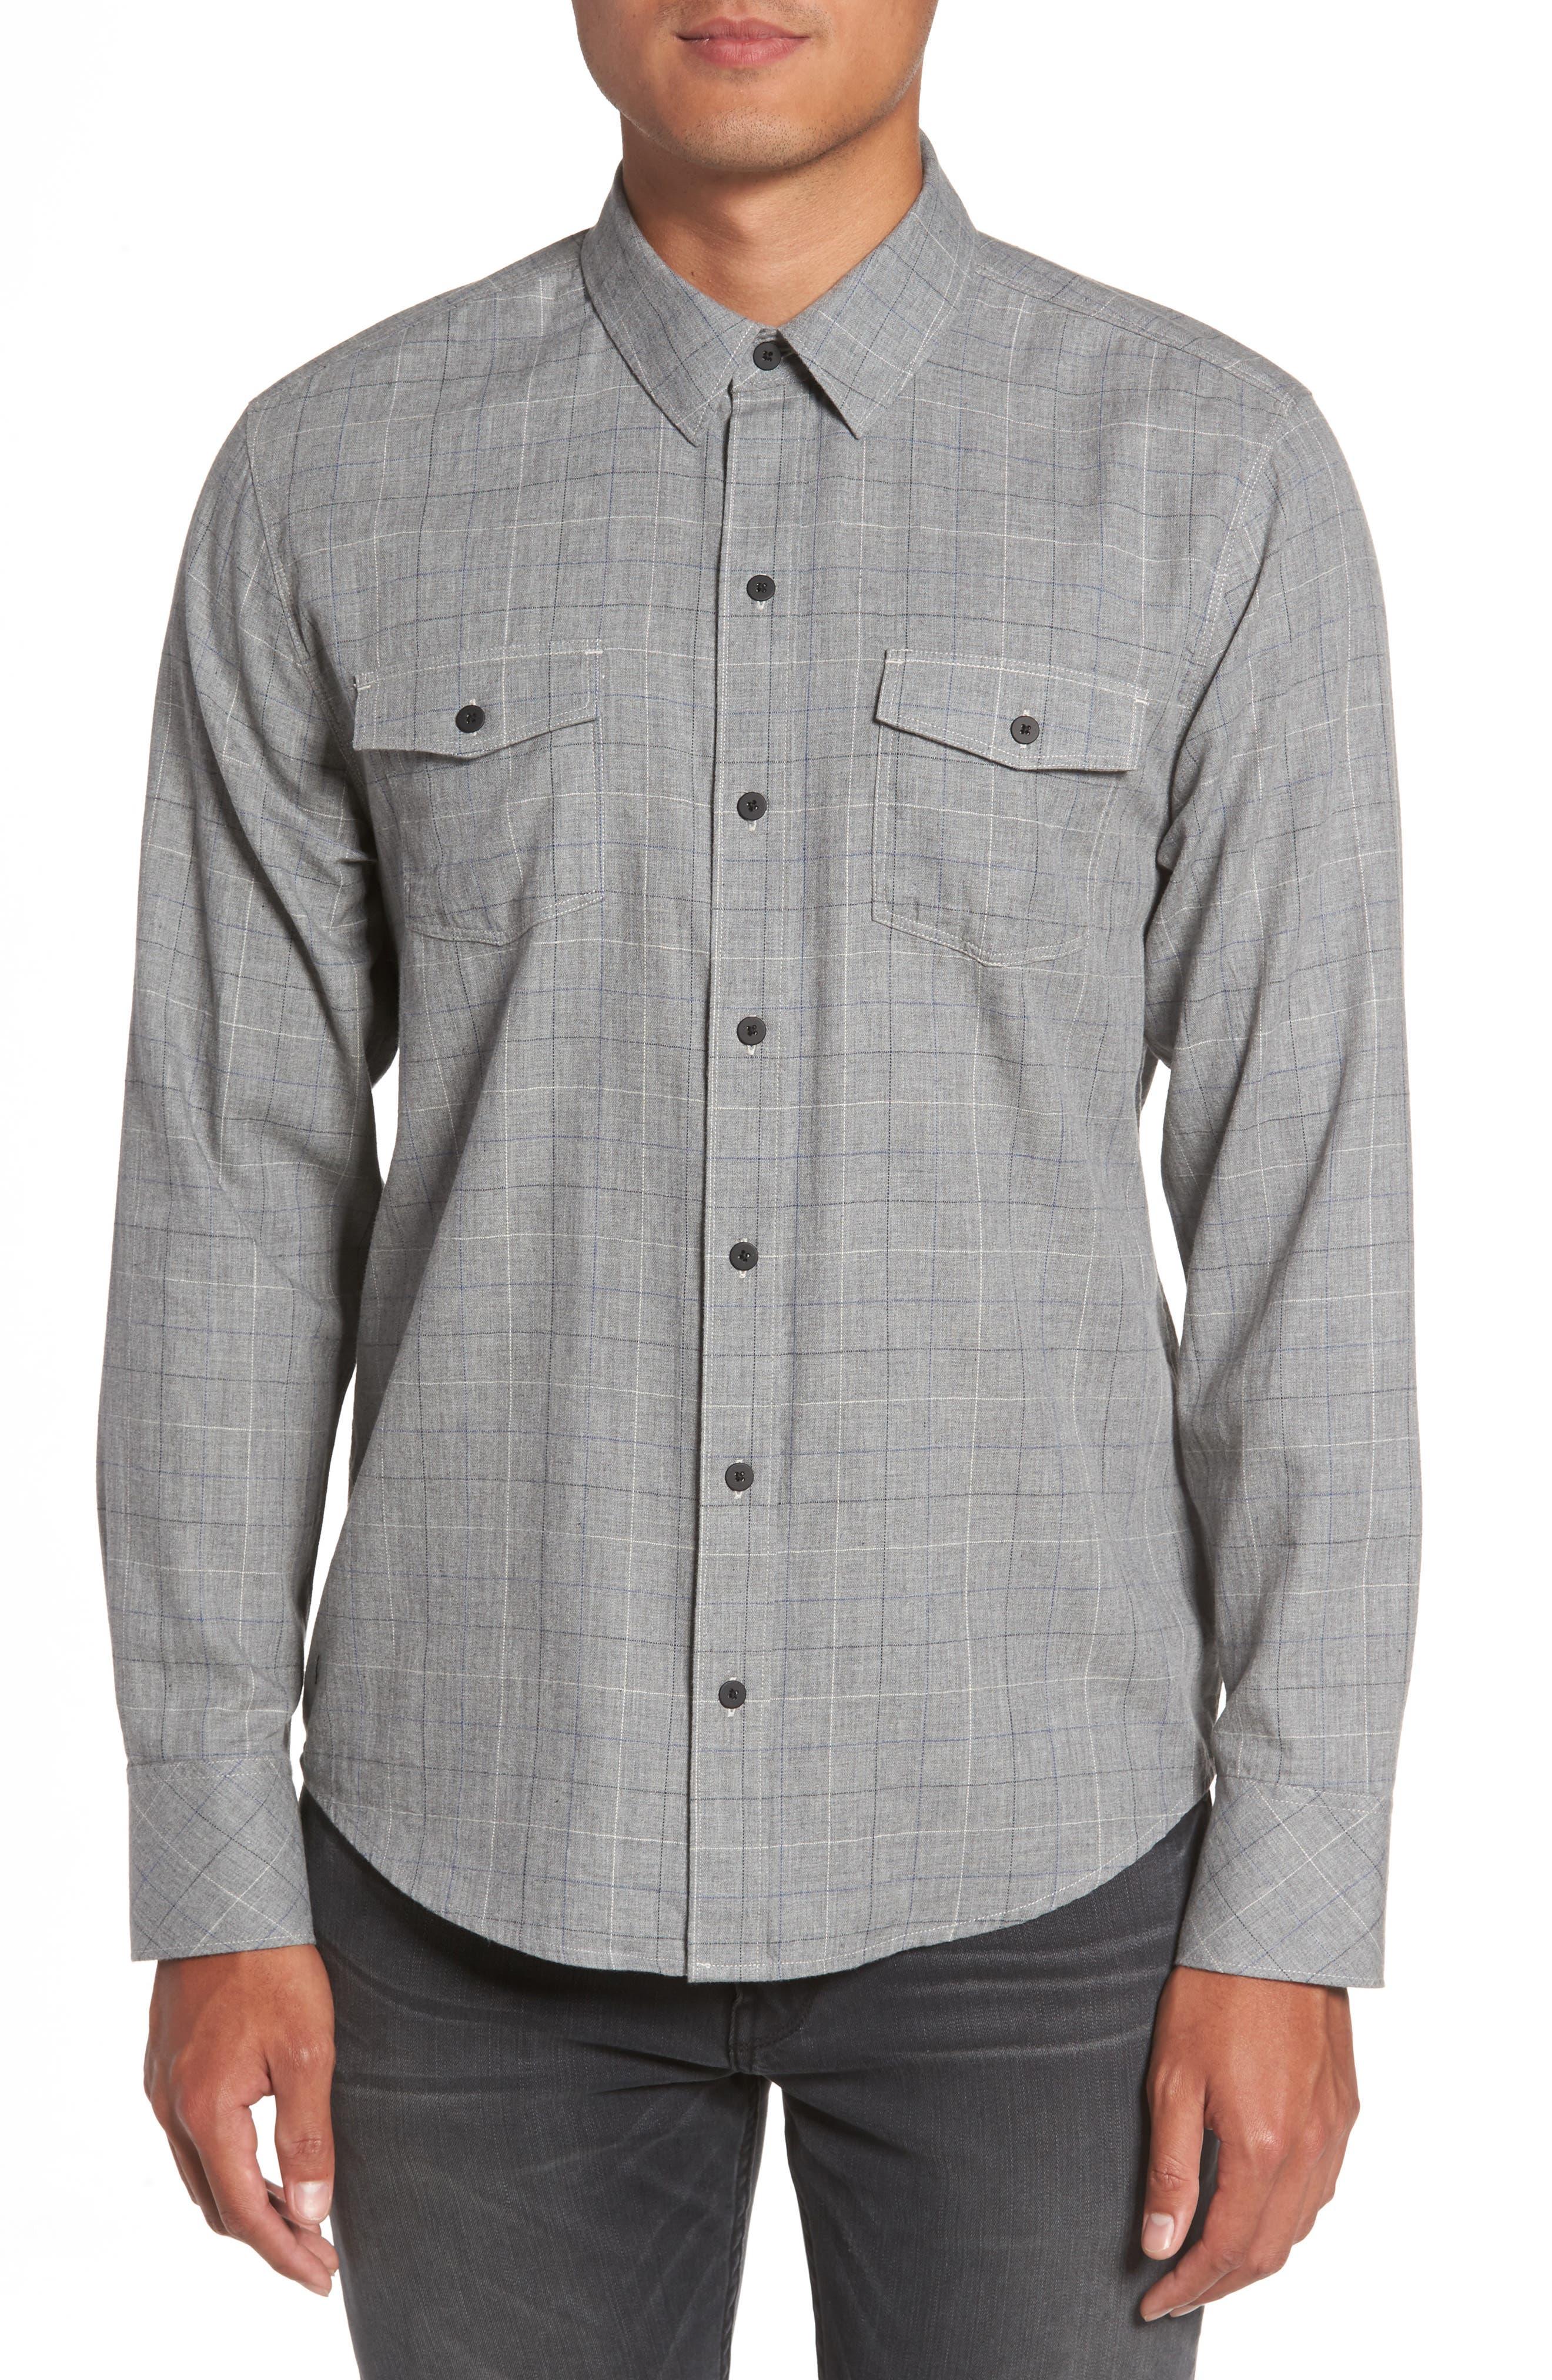 Alternate Image 1 Selected - PAIGE Everett Tattersall Sport Shirt